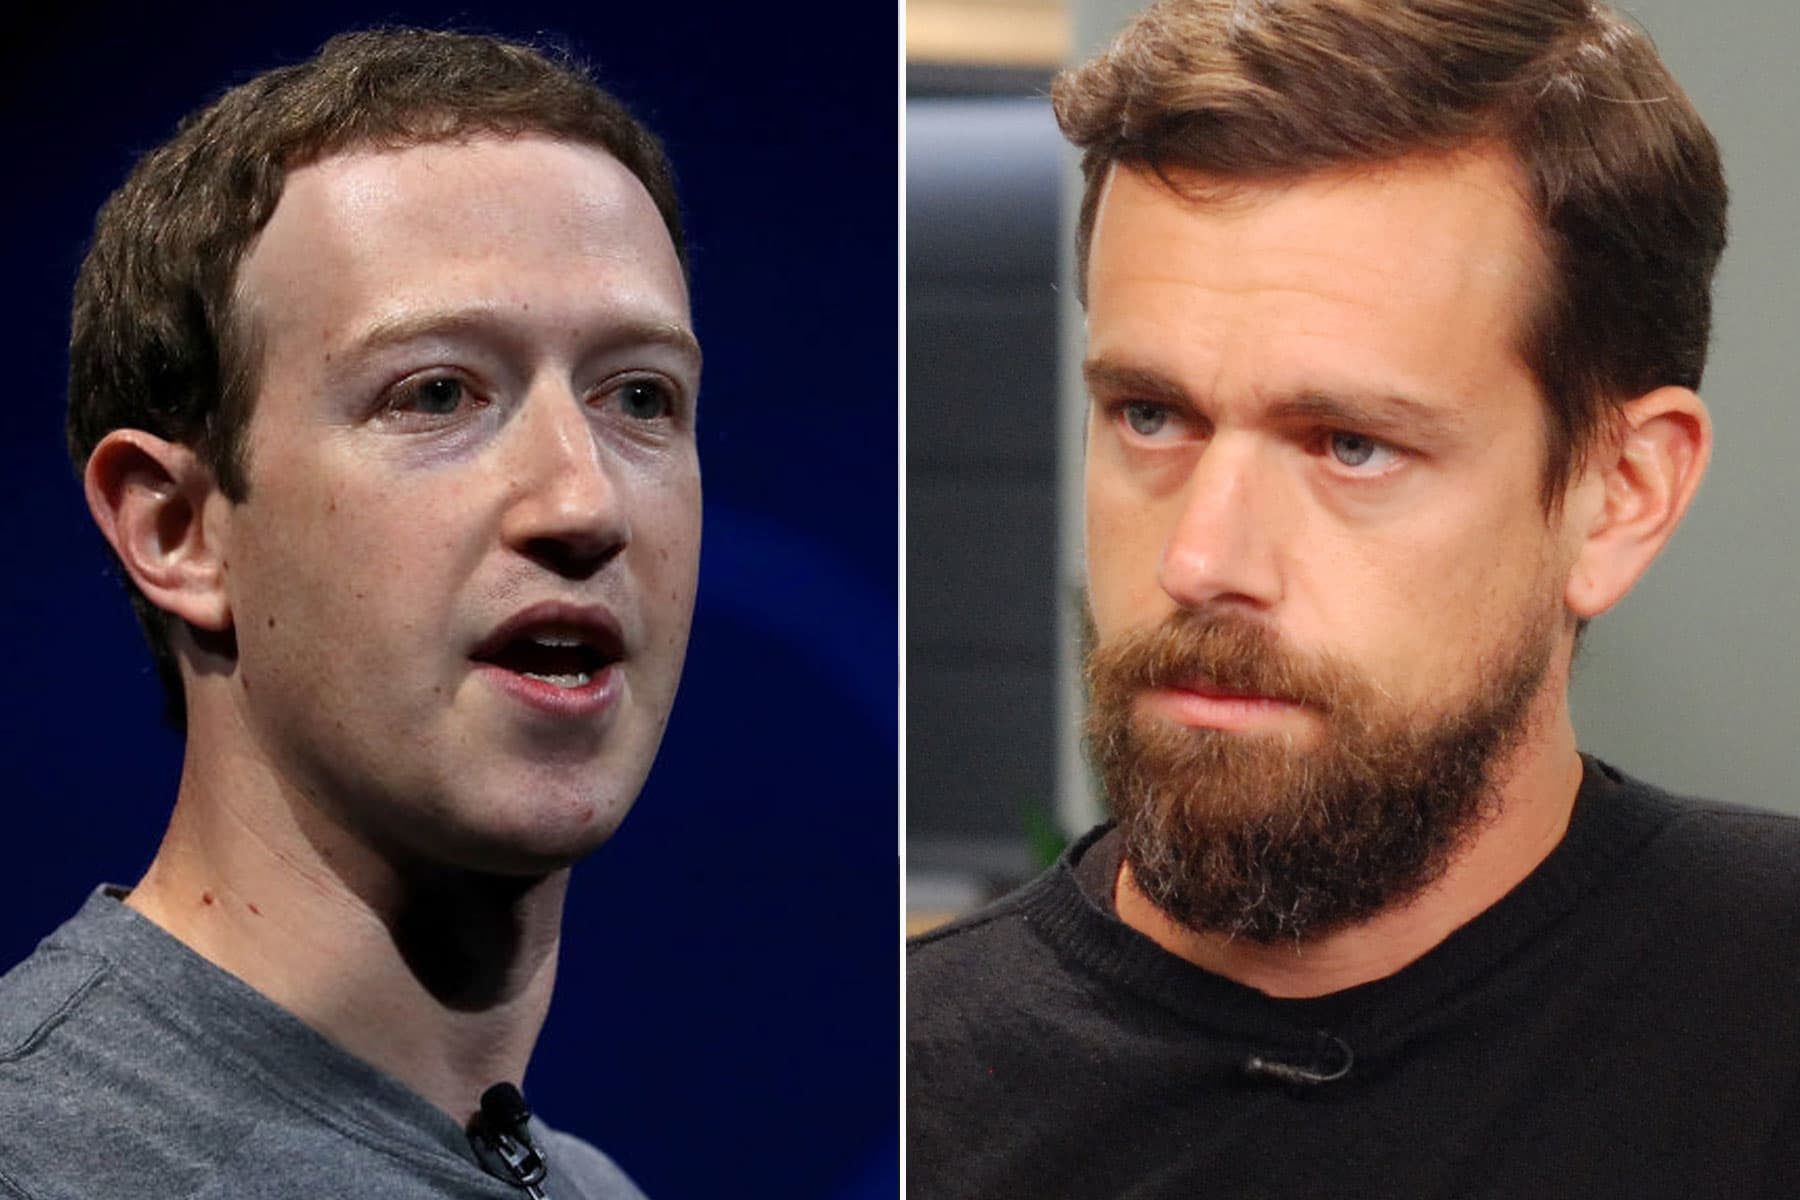 Mark Zuckerberg vs. Jack Dorsey is the most interesting battle in Silicon Valley